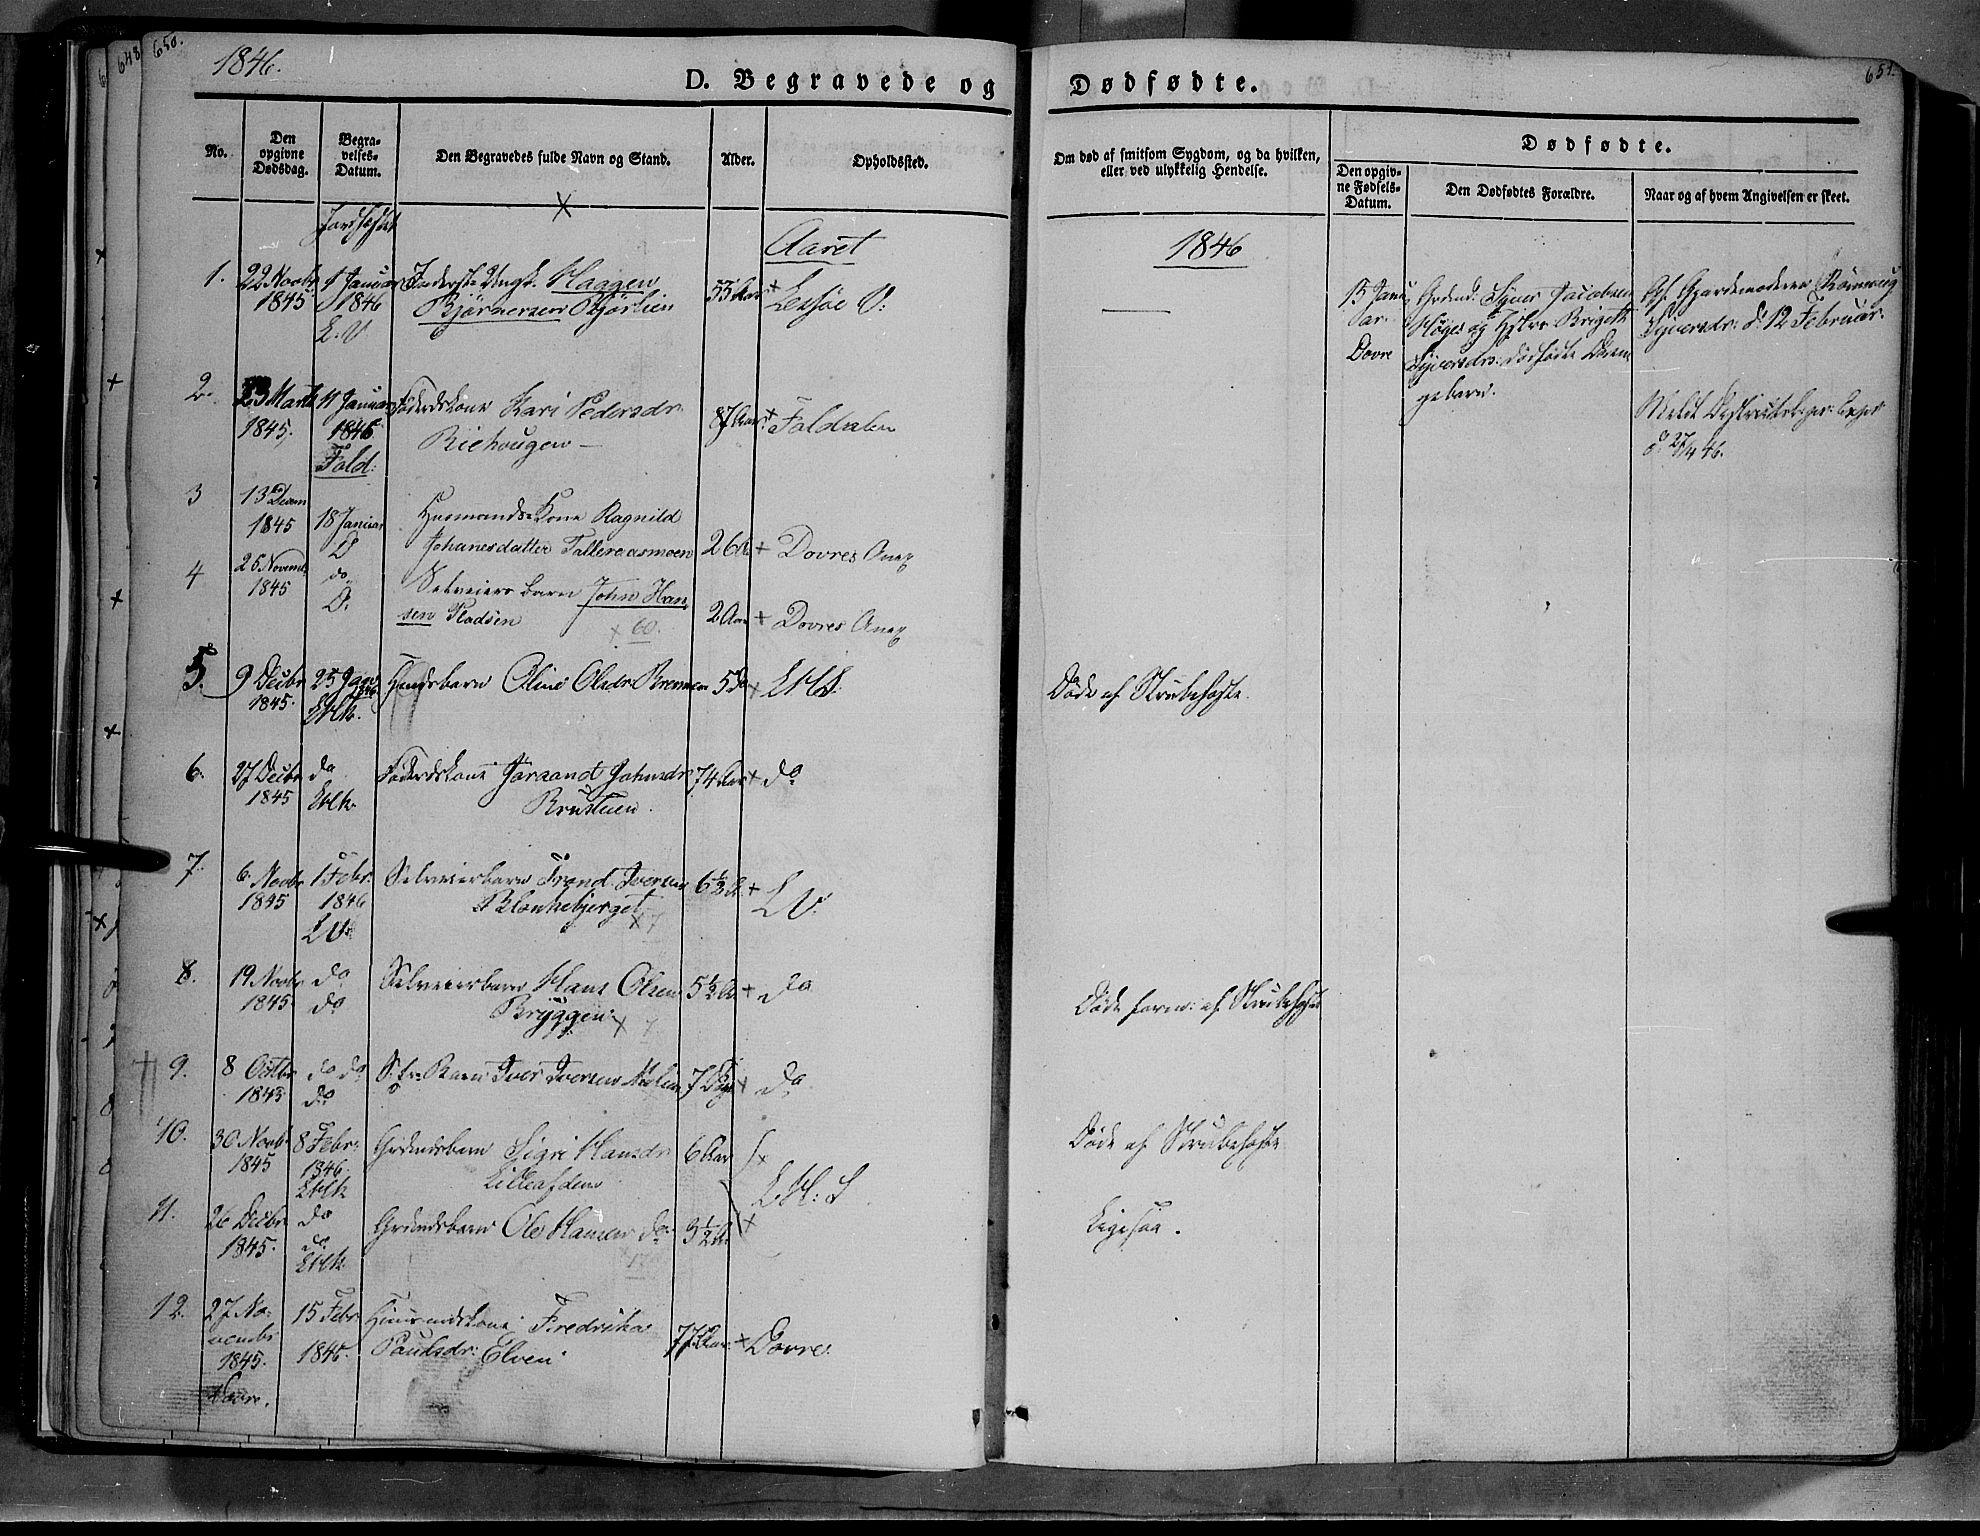 SAH, Lesja prestekontor, Ministerialbok nr. 6B, 1843-1854, s. 650-651